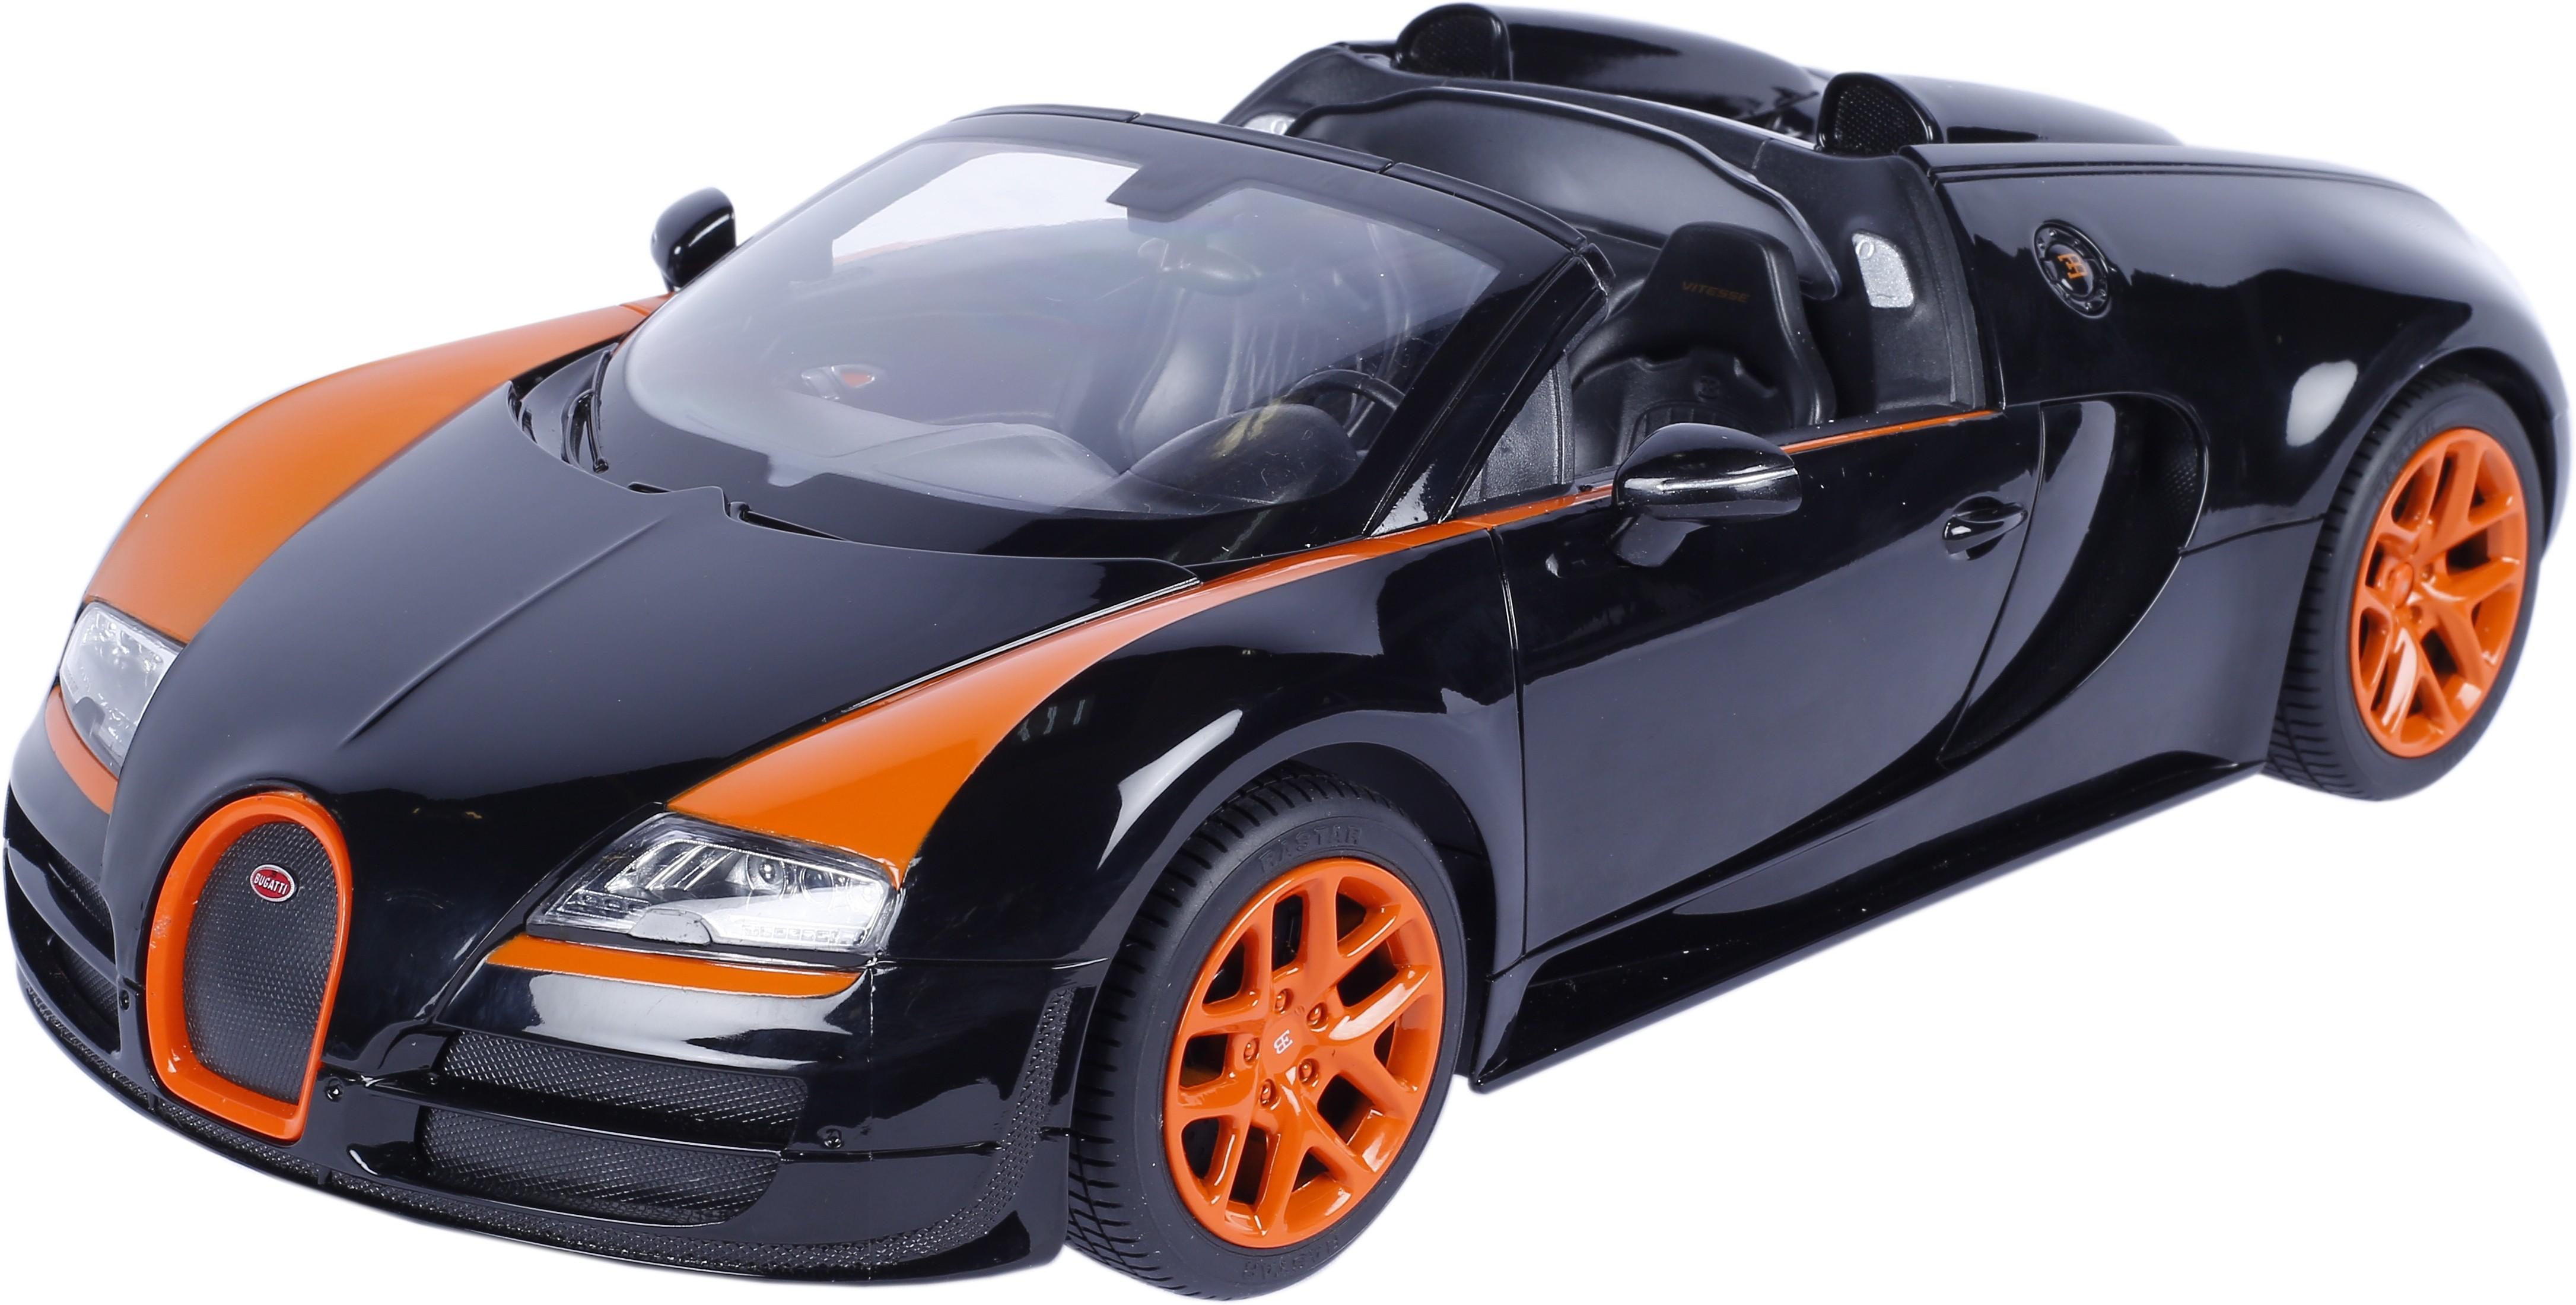 45% off on toyhouse radio remote control 1:14 bugatti veyron 16.4